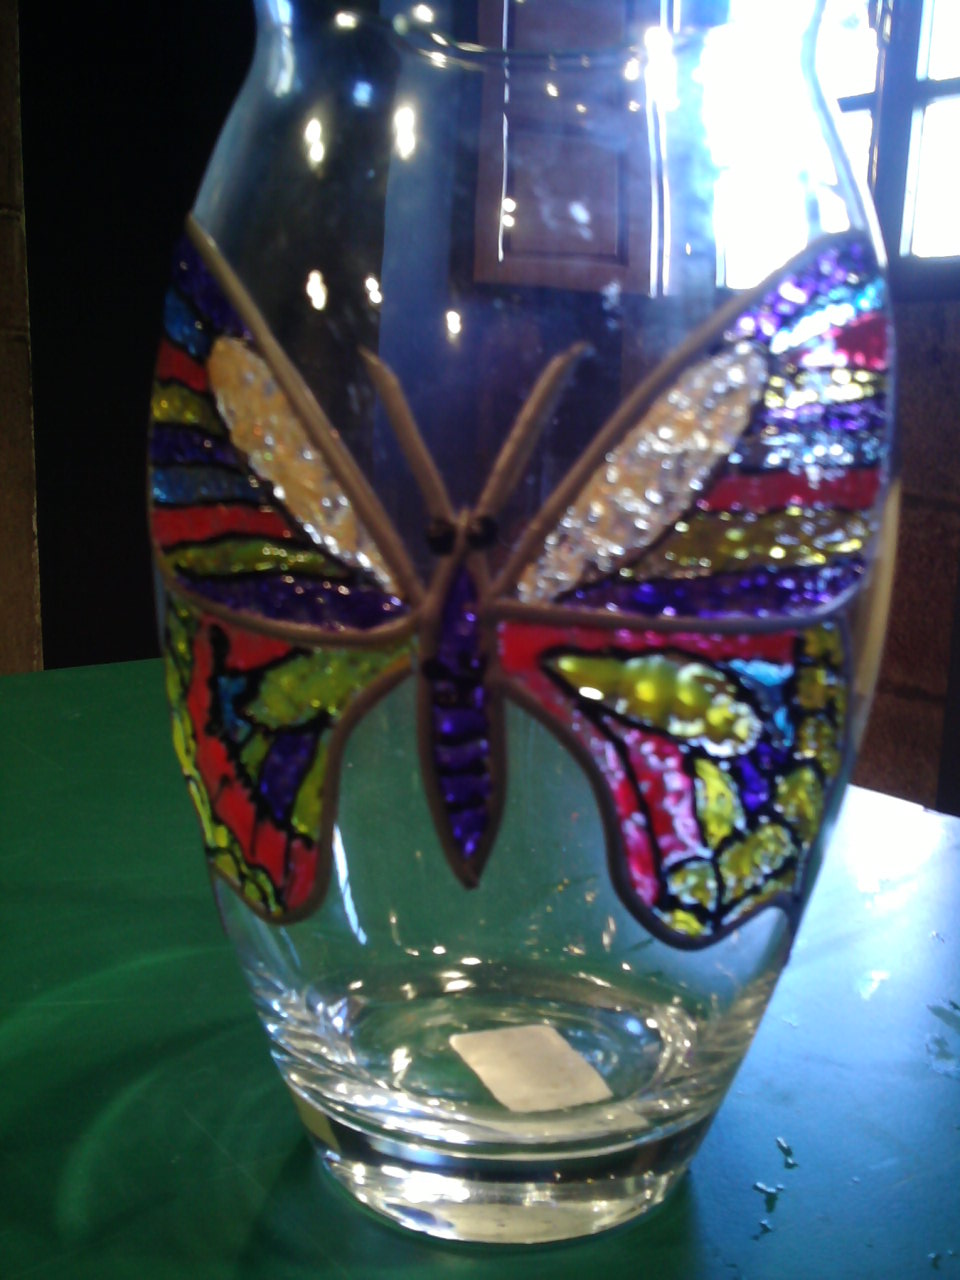 Artes decorativas geli molina jarron de cristal for Jarron cristal